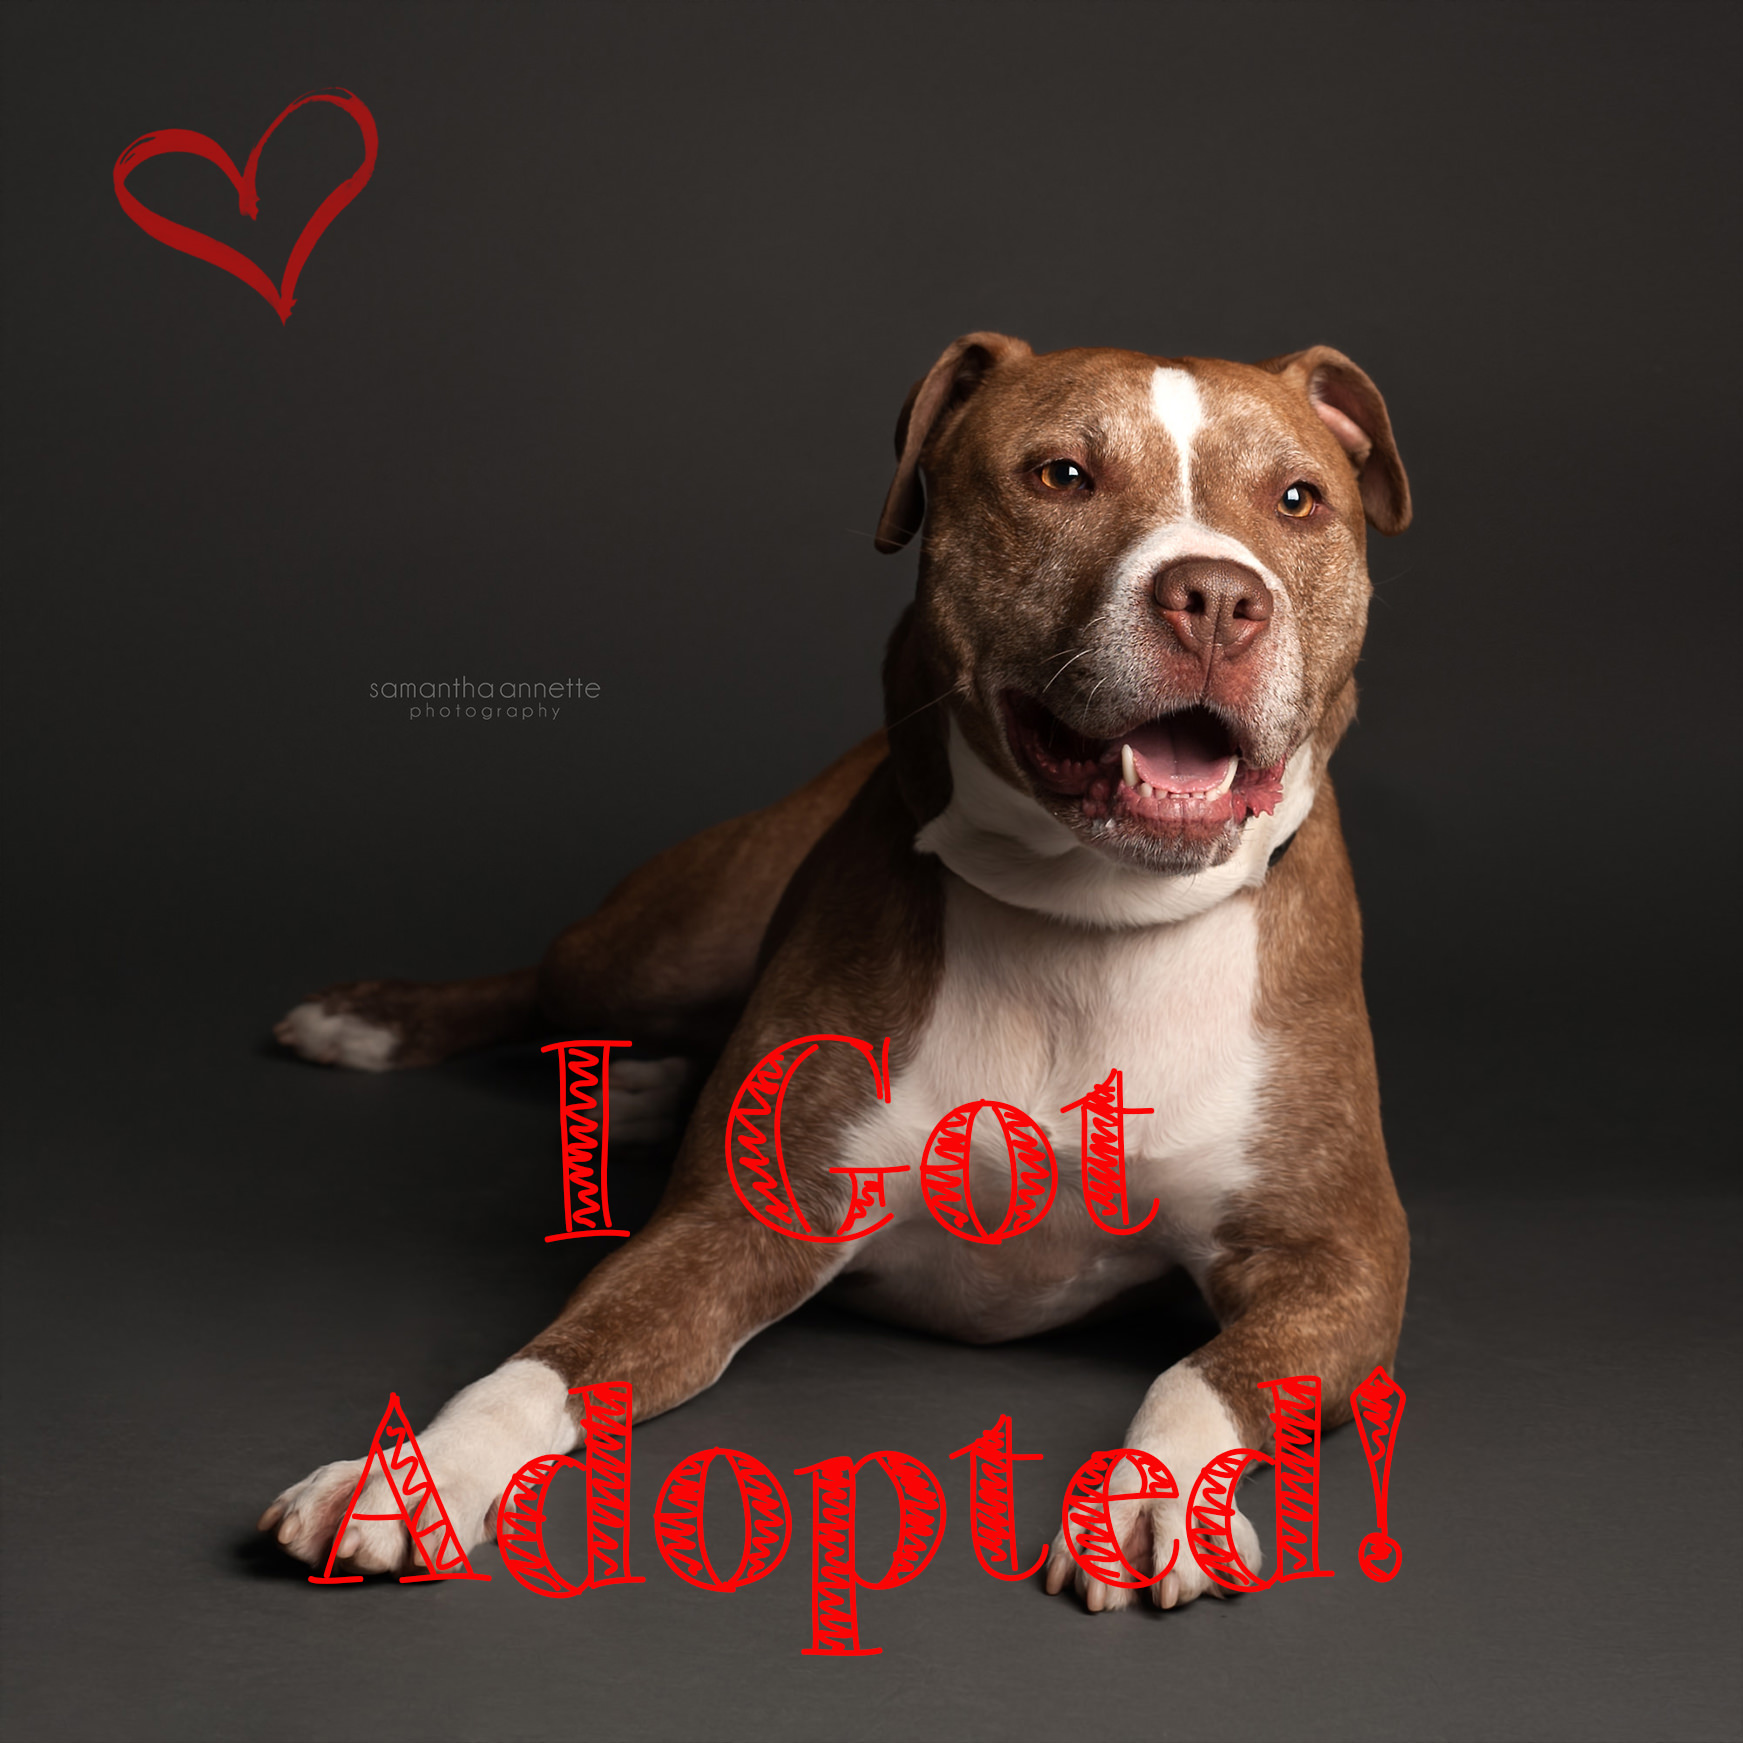 Tacoma got adopted.jpg